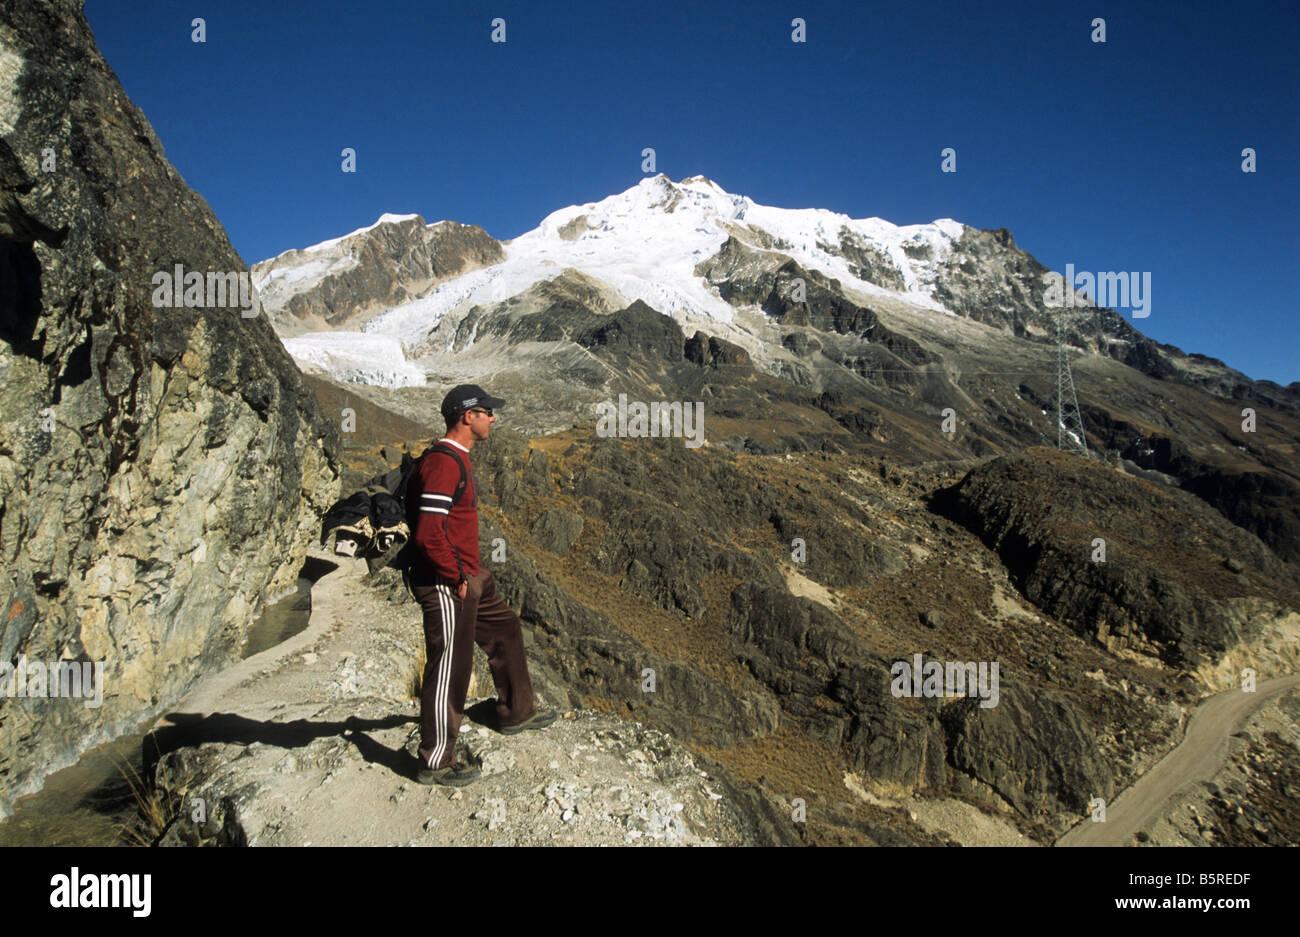 Trekker near Mount Huayna Potosi, Cordillera Real, Bolivia - Stock Image